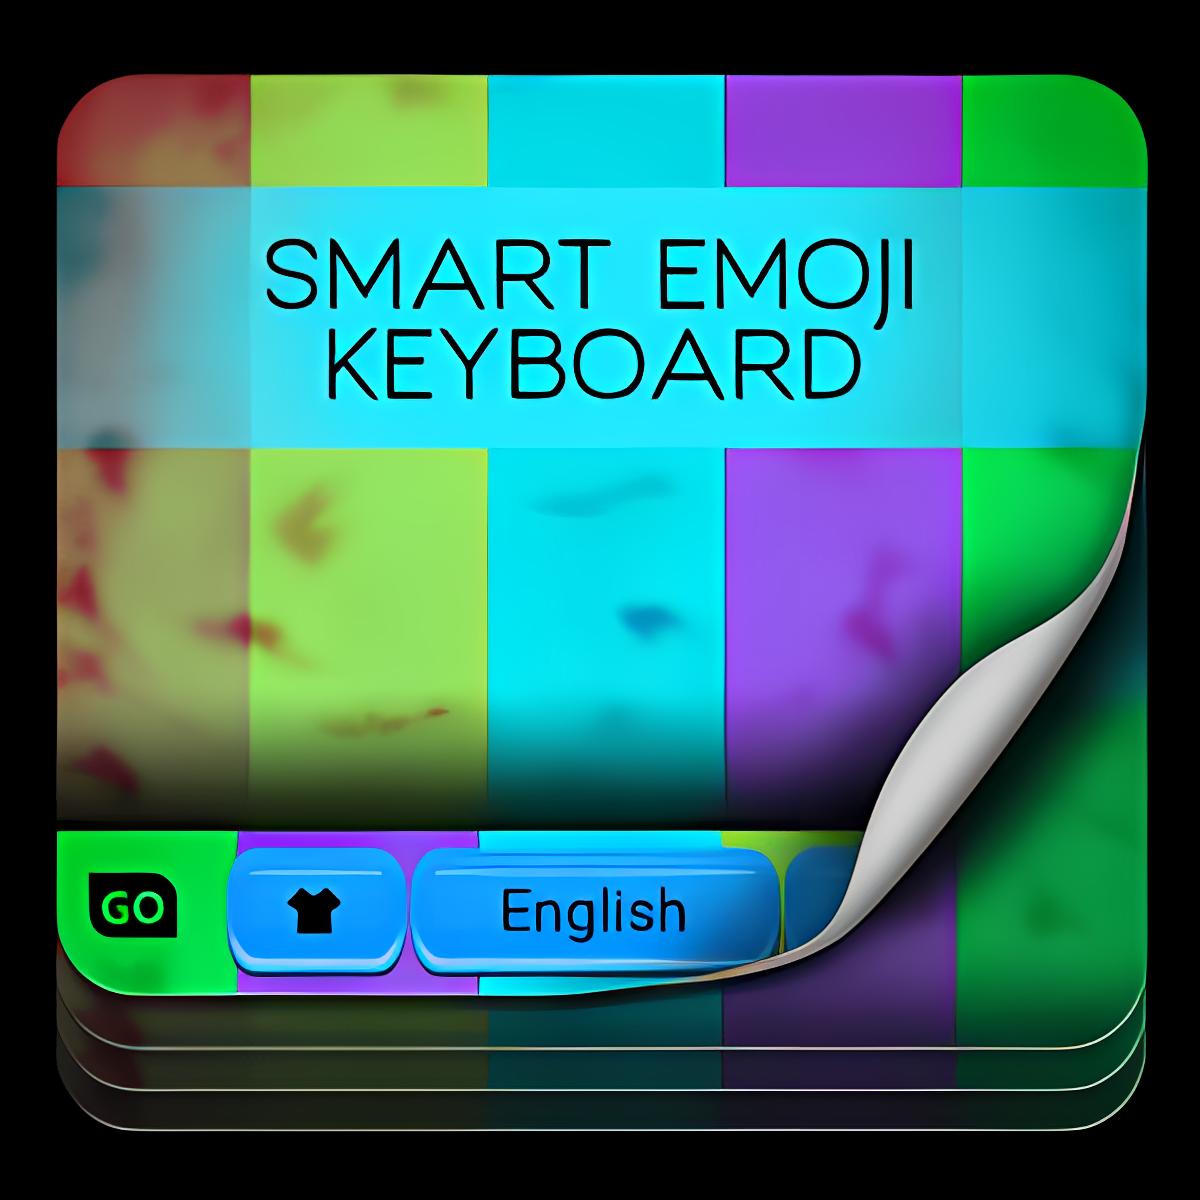 Inteligente Emoji teclado